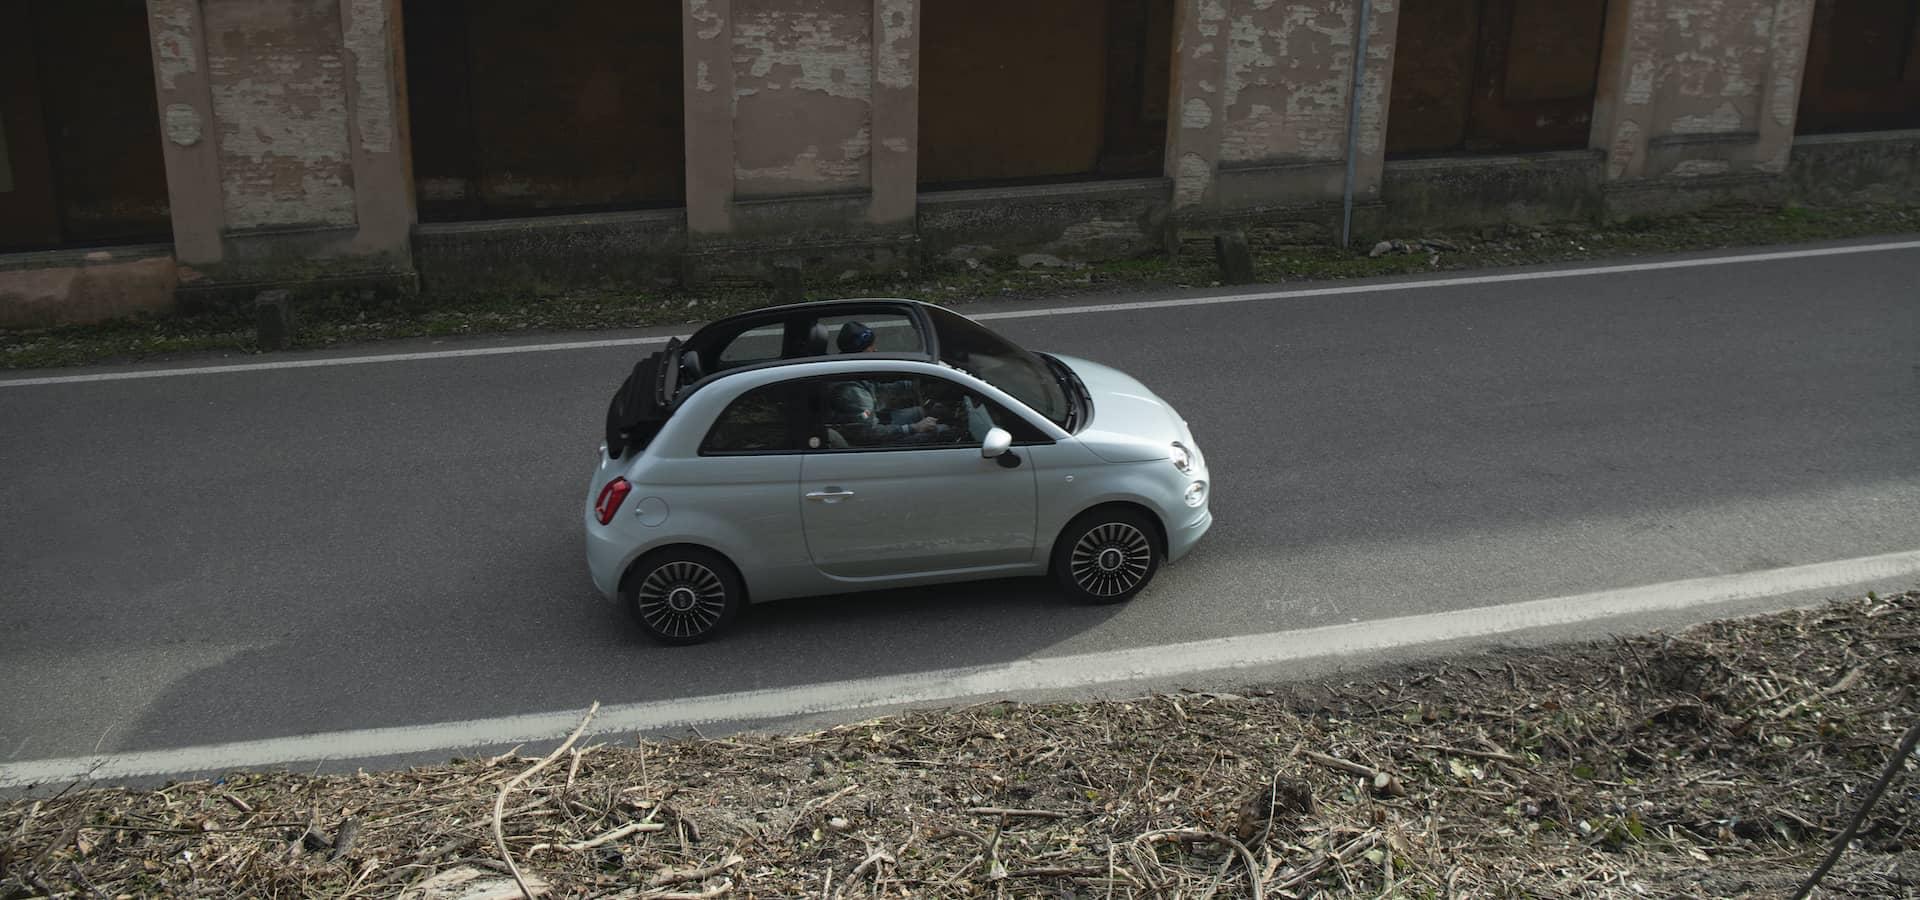 Fiat 500C Hybrid road test   The Car Expert